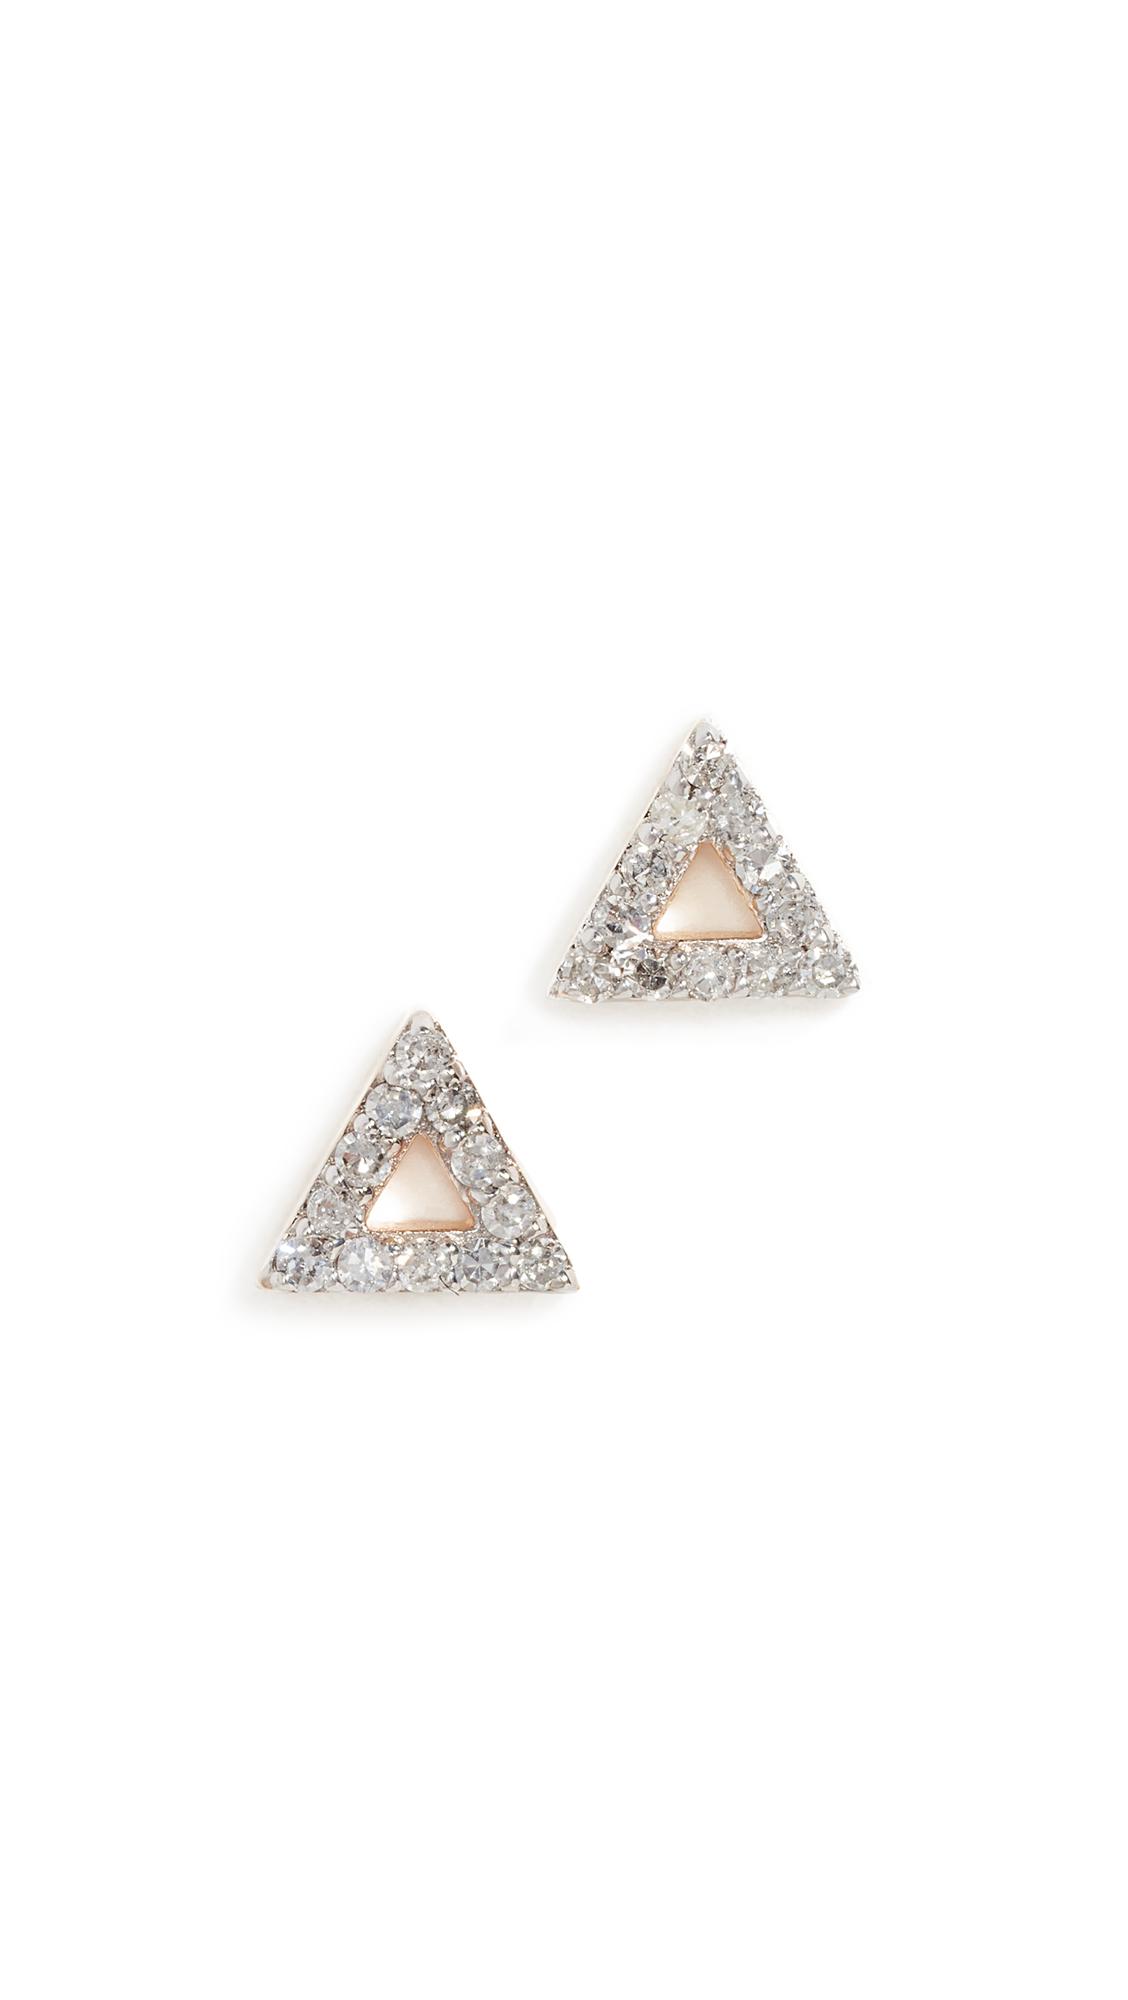 Mateo 14k Mini Diamond Triangle Studs In Yellow Gold